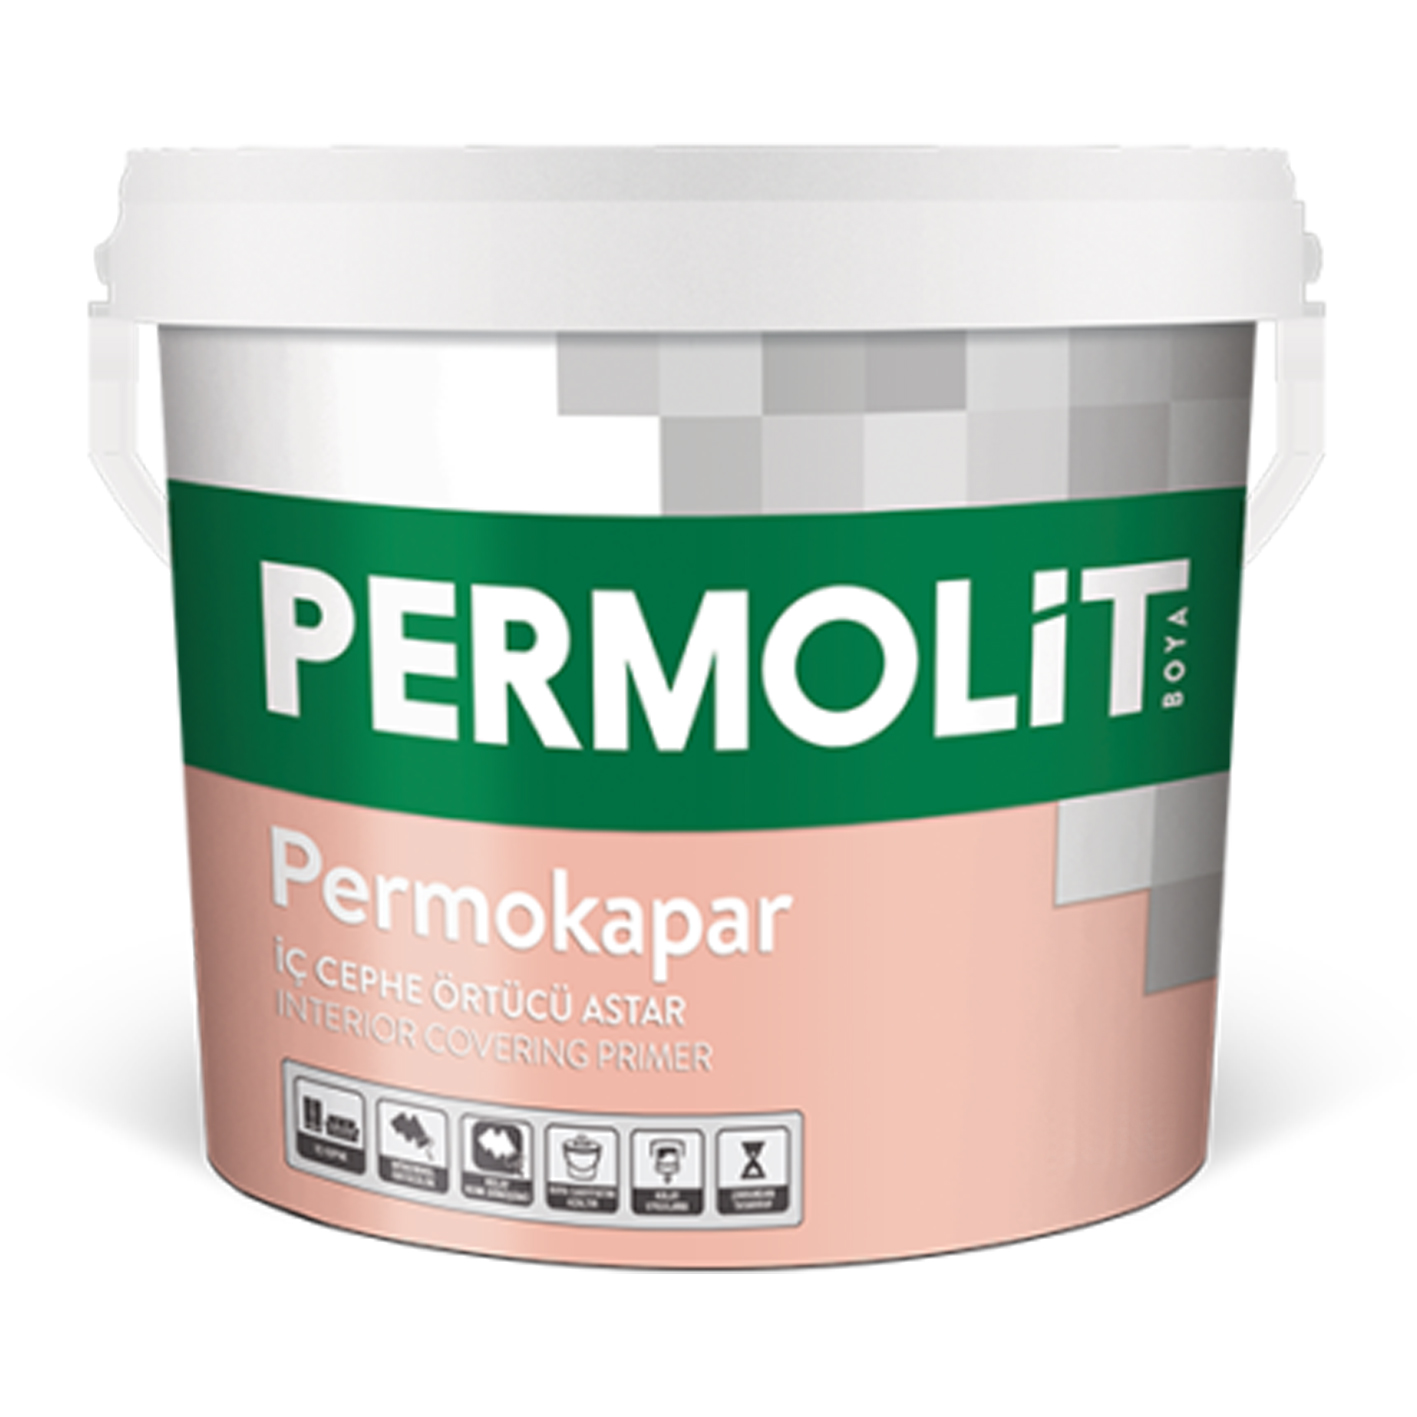 Permolit Permokapar İç Cephe Örtücü Astar 3.5Kg